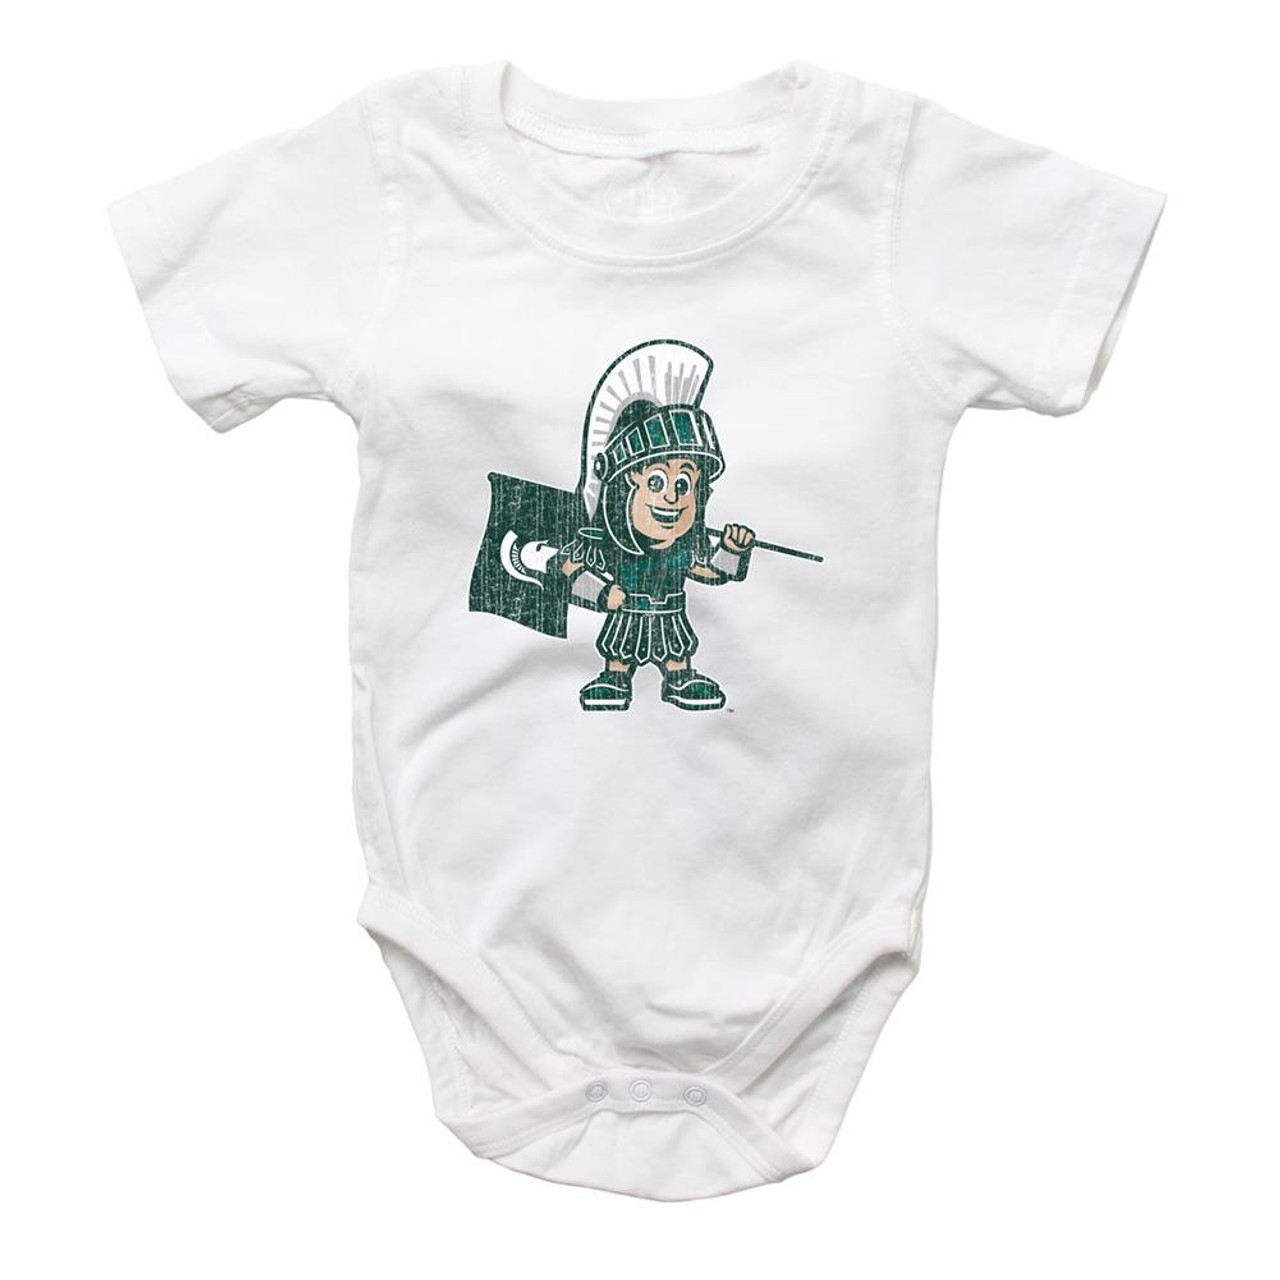 Infant Michigan State University Bodysuits 3 Pack Organic Cotton Set